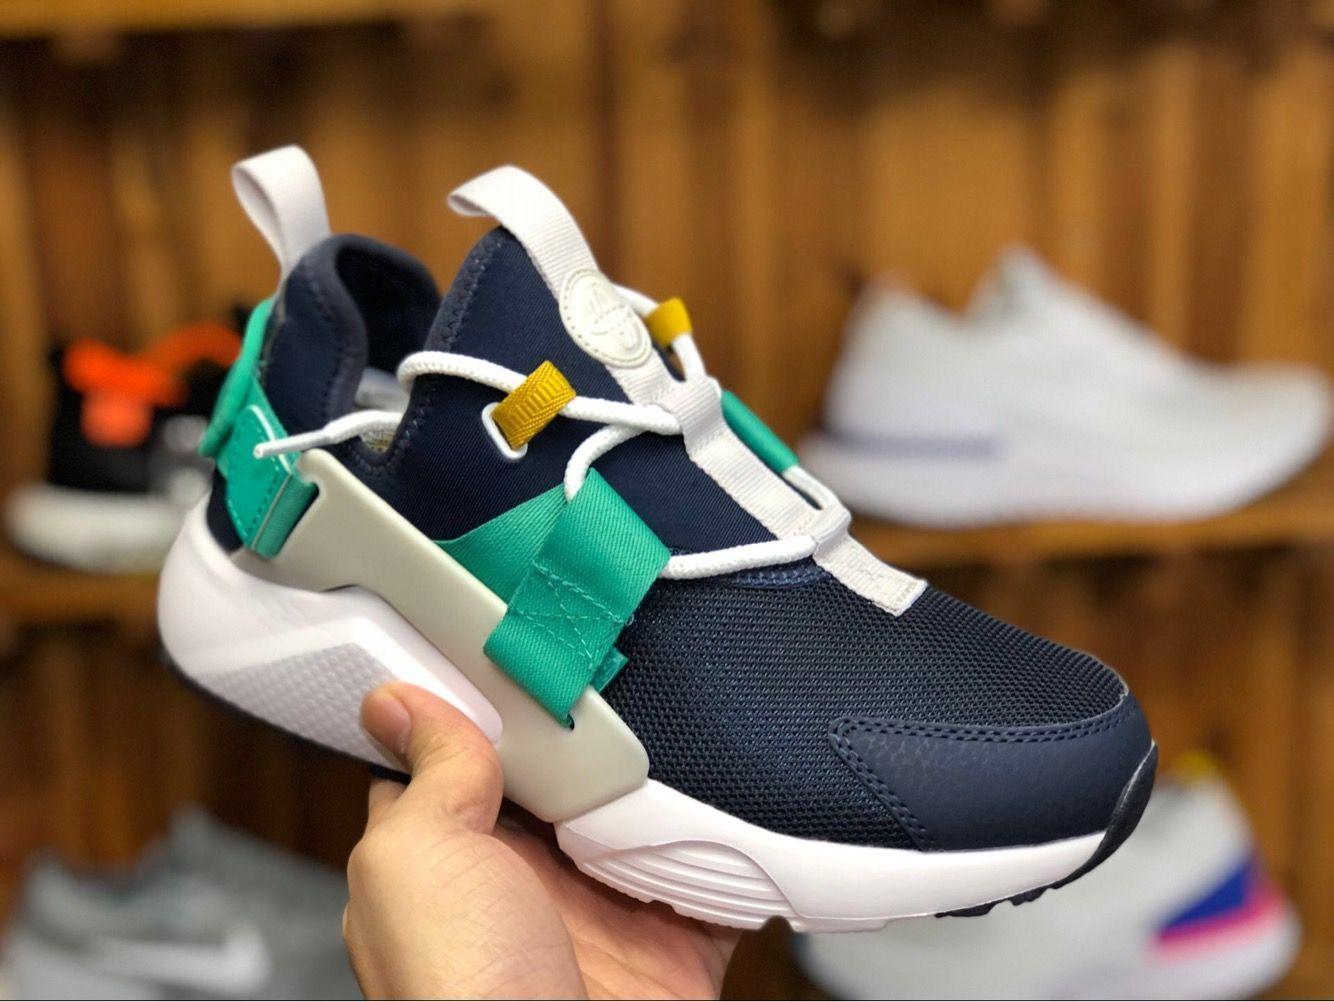 25c1f63a38140 68 Nike Air Huarache City Low Navy Mint Green Casual Sneaker | Cute ...